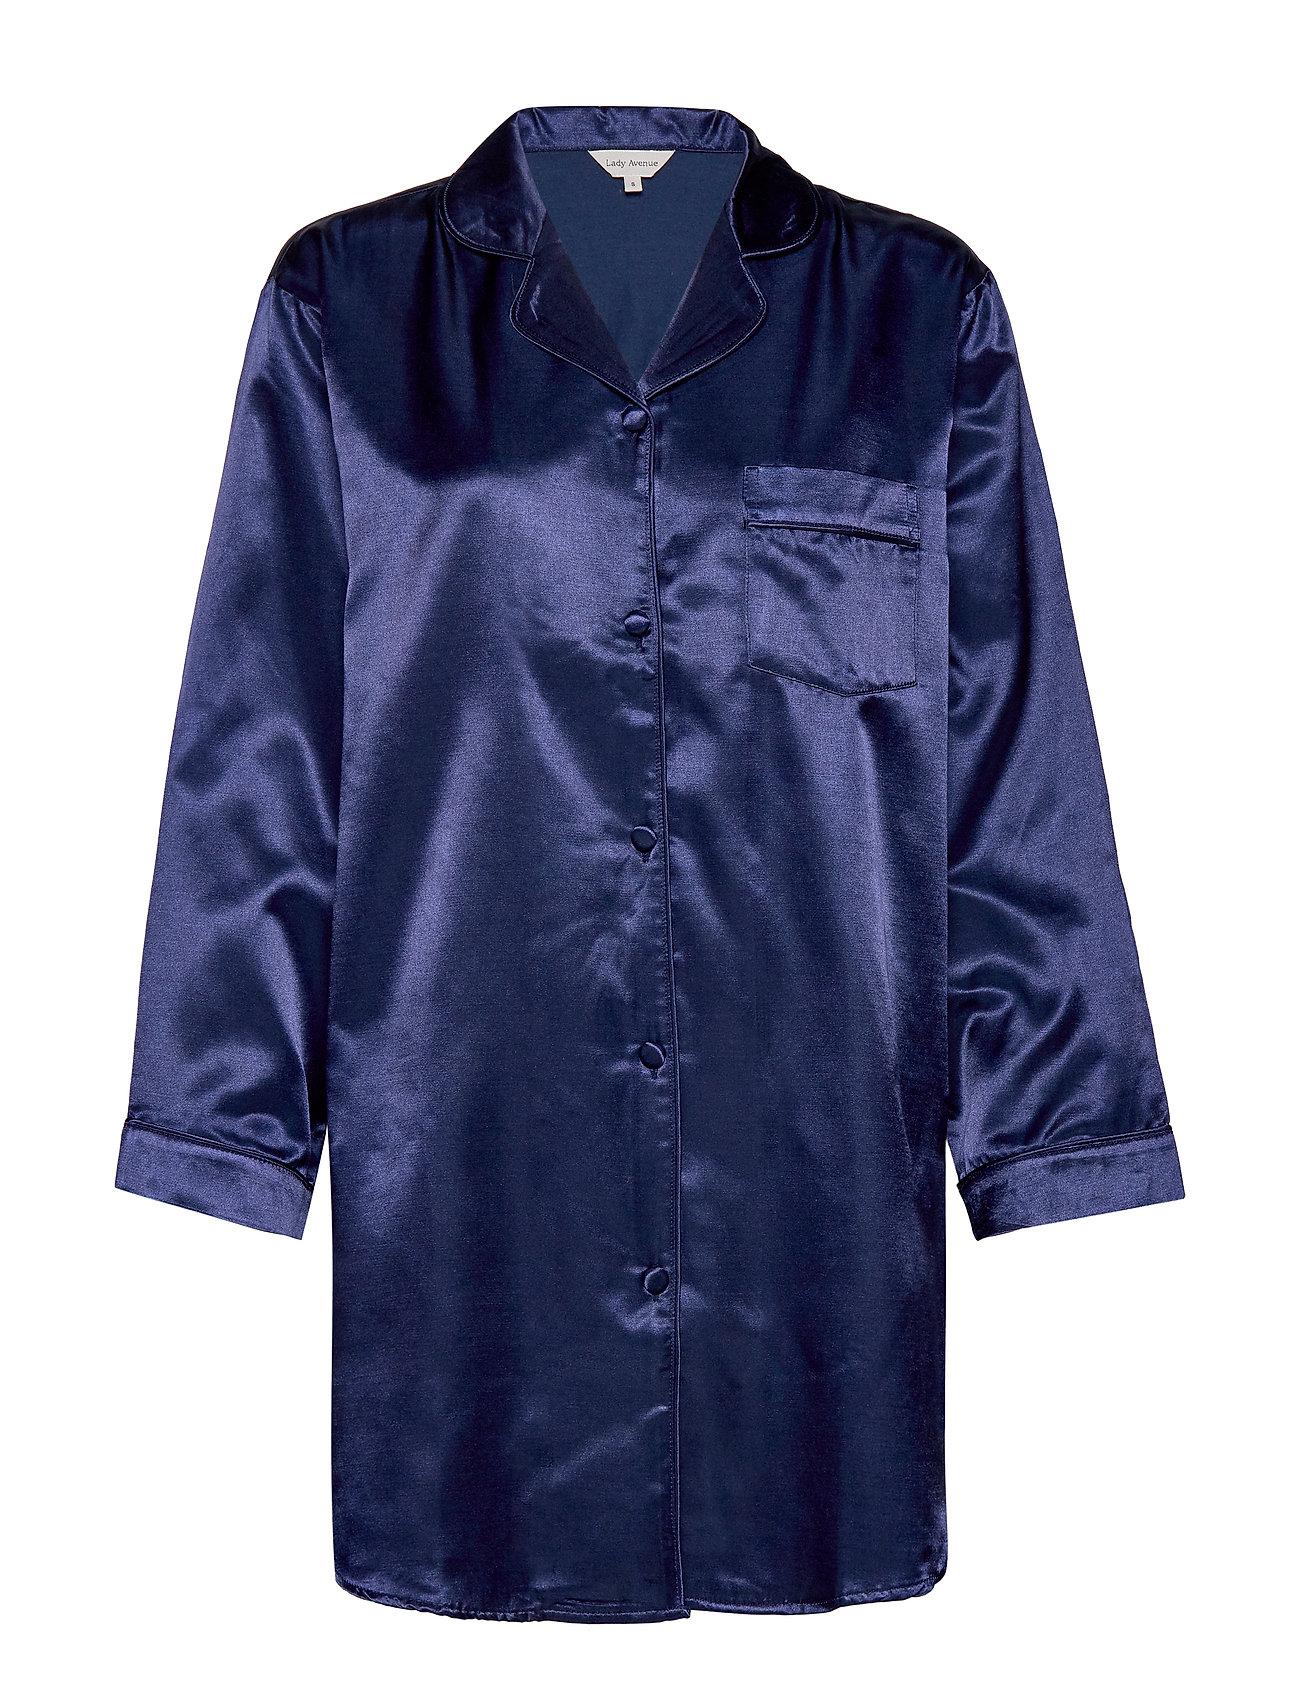 Lady Avenue Satin Long Sleeve Nightshirt - NAVY